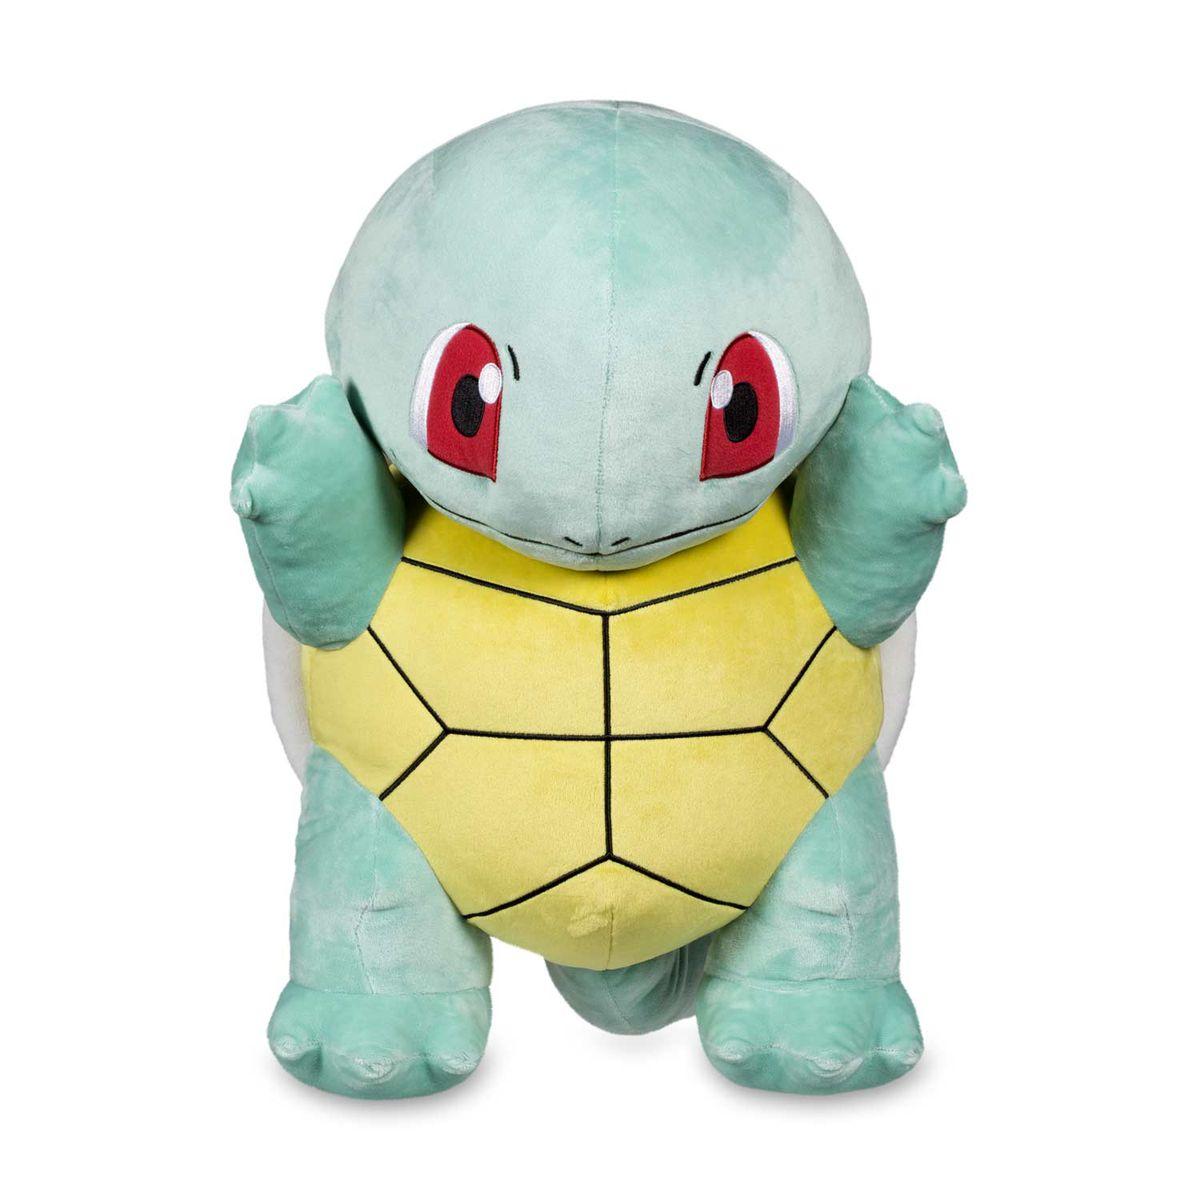 Jumbo Squirtle Pokémon plush